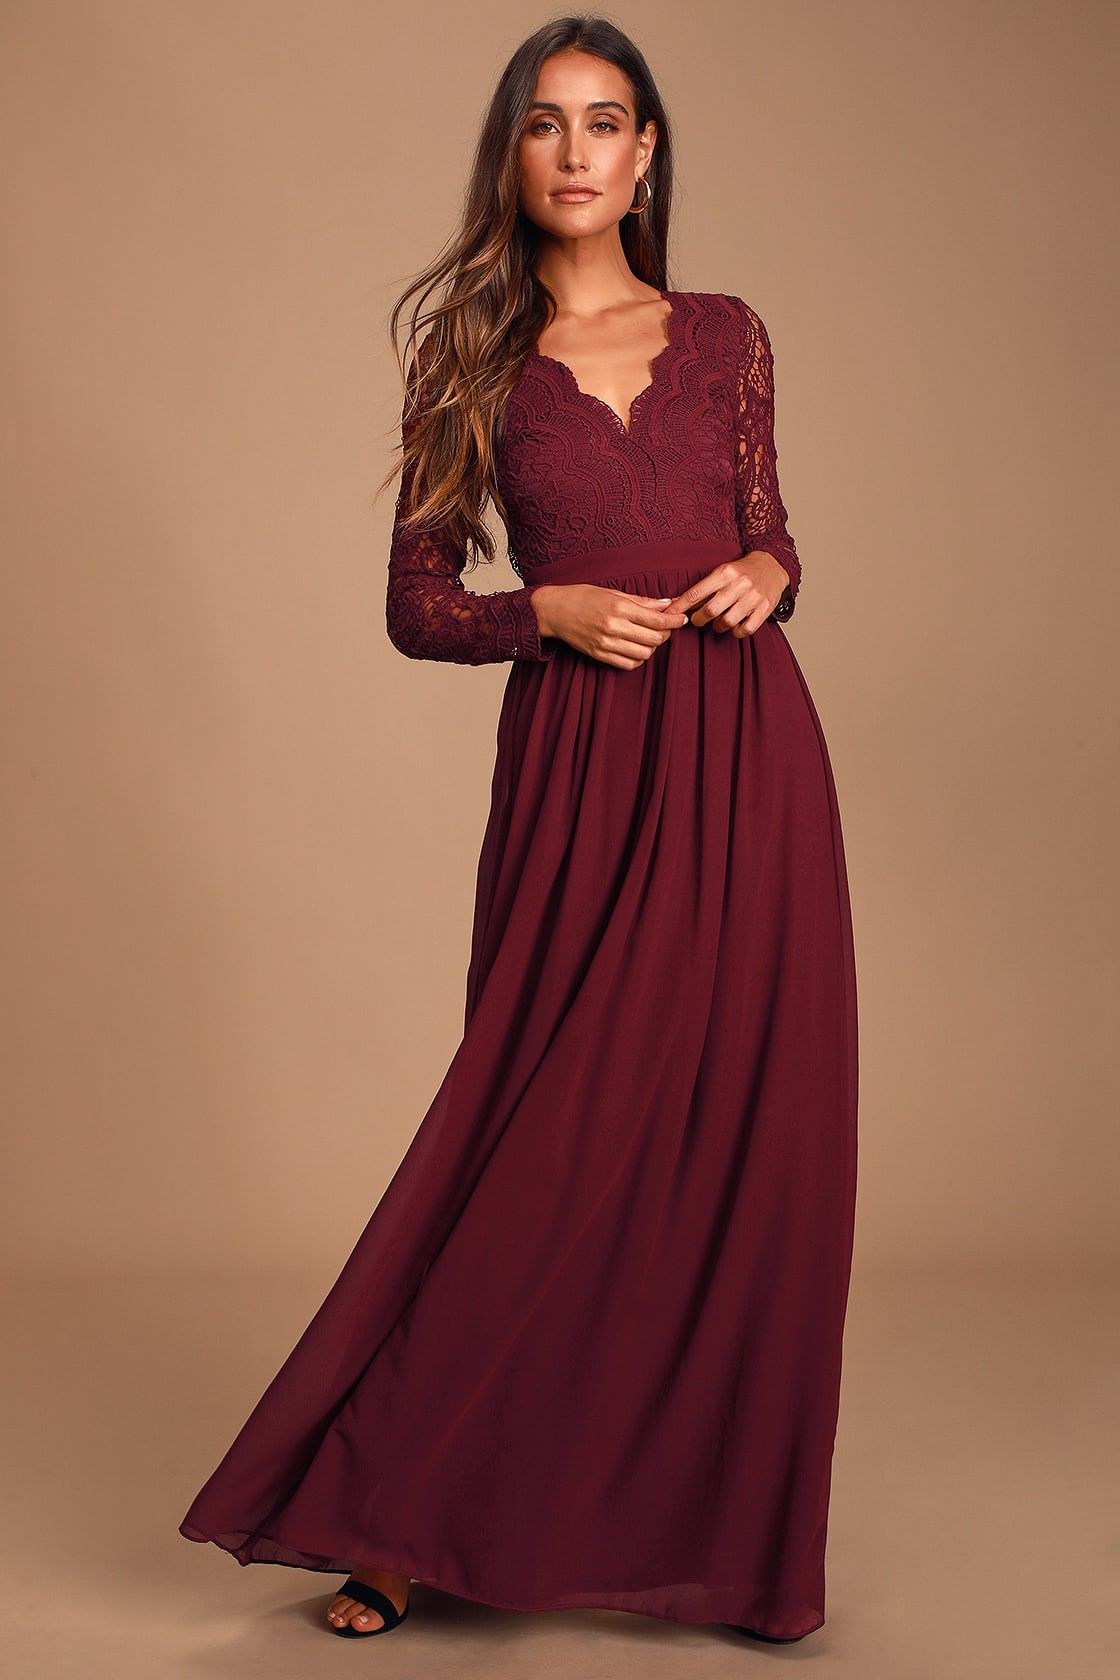 Awaken My Love Burgundy Long Sleeve Lace Maxi Dress Long Sleeve Lace Maxi Dress Long Sleeve Lace Bridesmaid Dresses Long Sleeve Bridesmaid Dress [ 1680 x 1120 Pixel ]